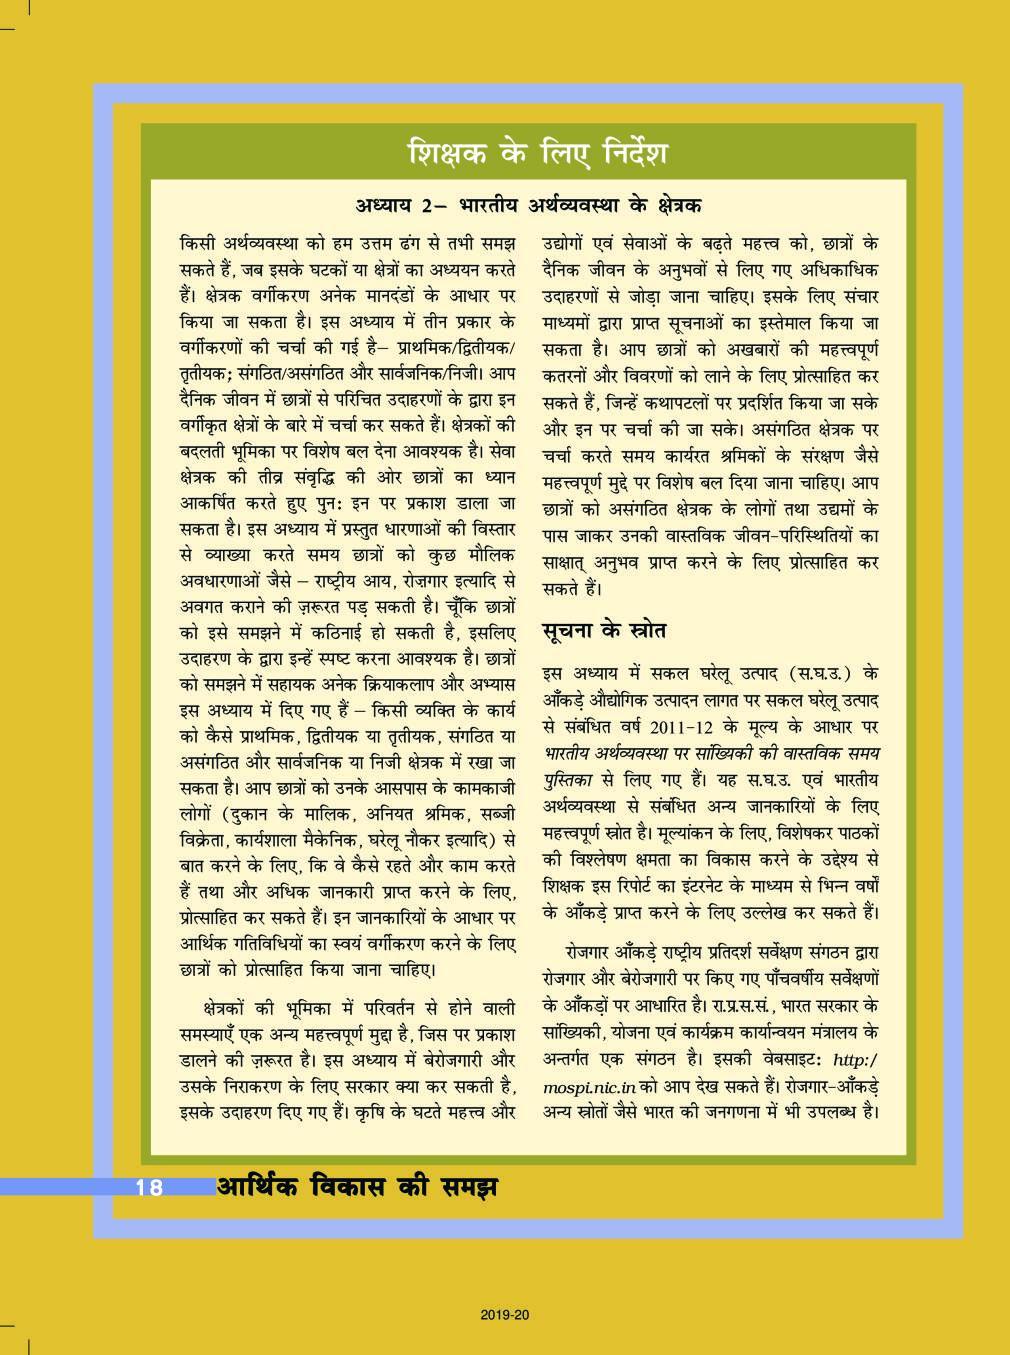 NCERT Book Class 10 Social Science (अर्थशास्त्र) Chapter 2 भारतीय अर्थव्यवस्था के क्षेत्रक - Page 1